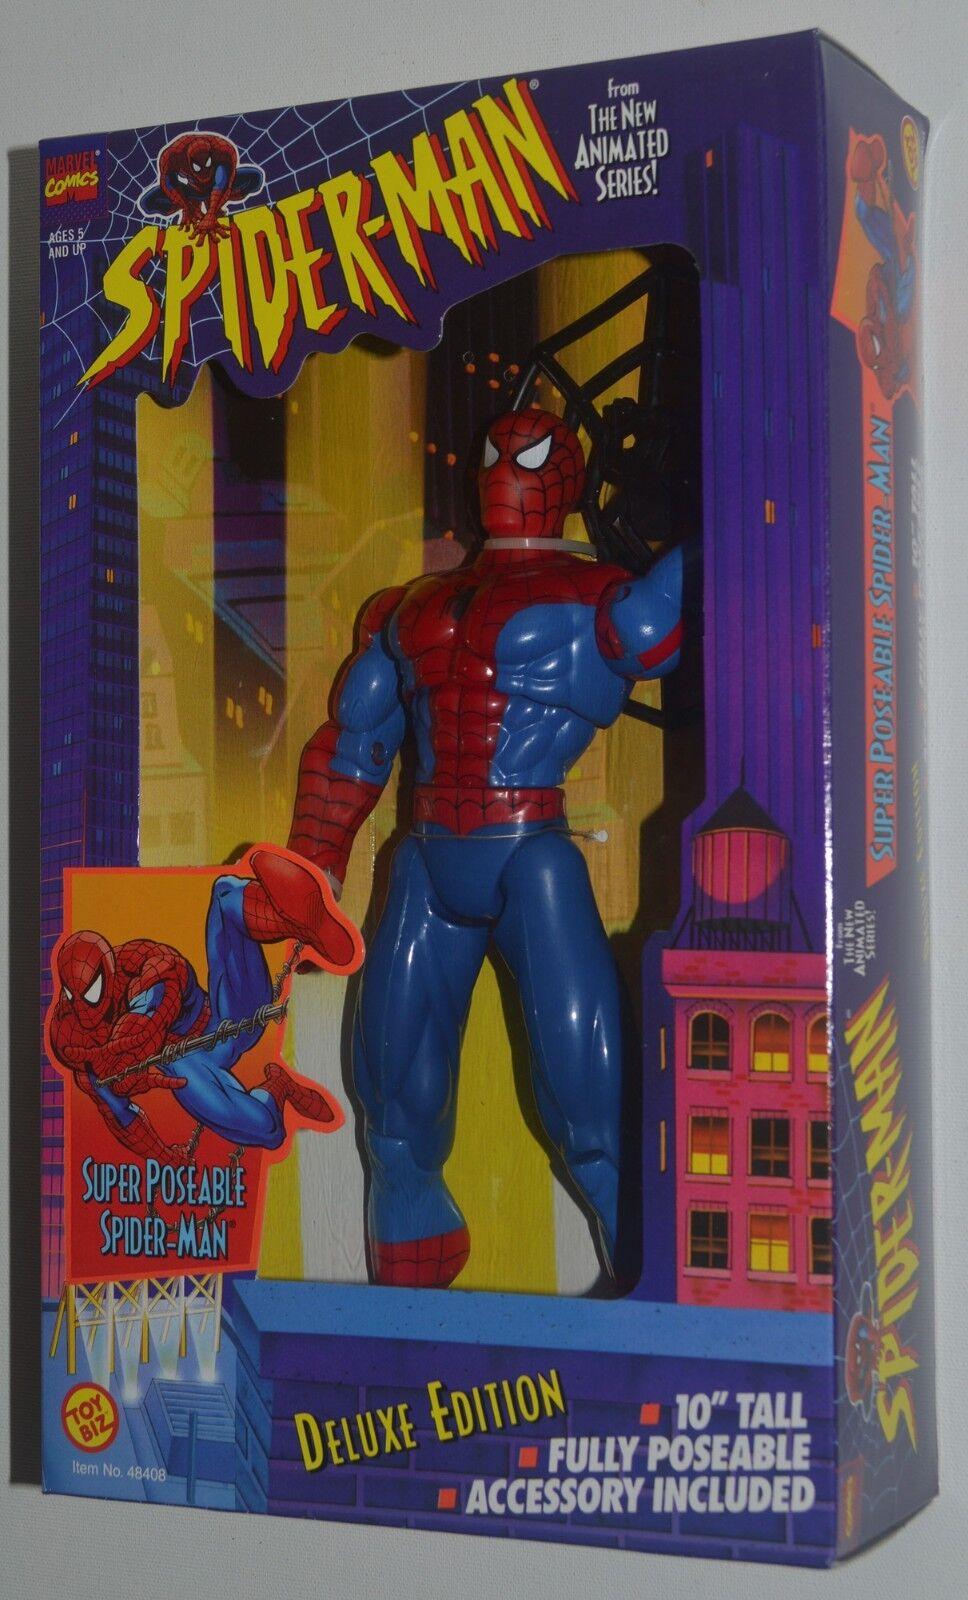 SUPER POSABLE SPIDER-MAN Deluxe Edition 10  Action Figure Toy Biz 1995 HTF MIB